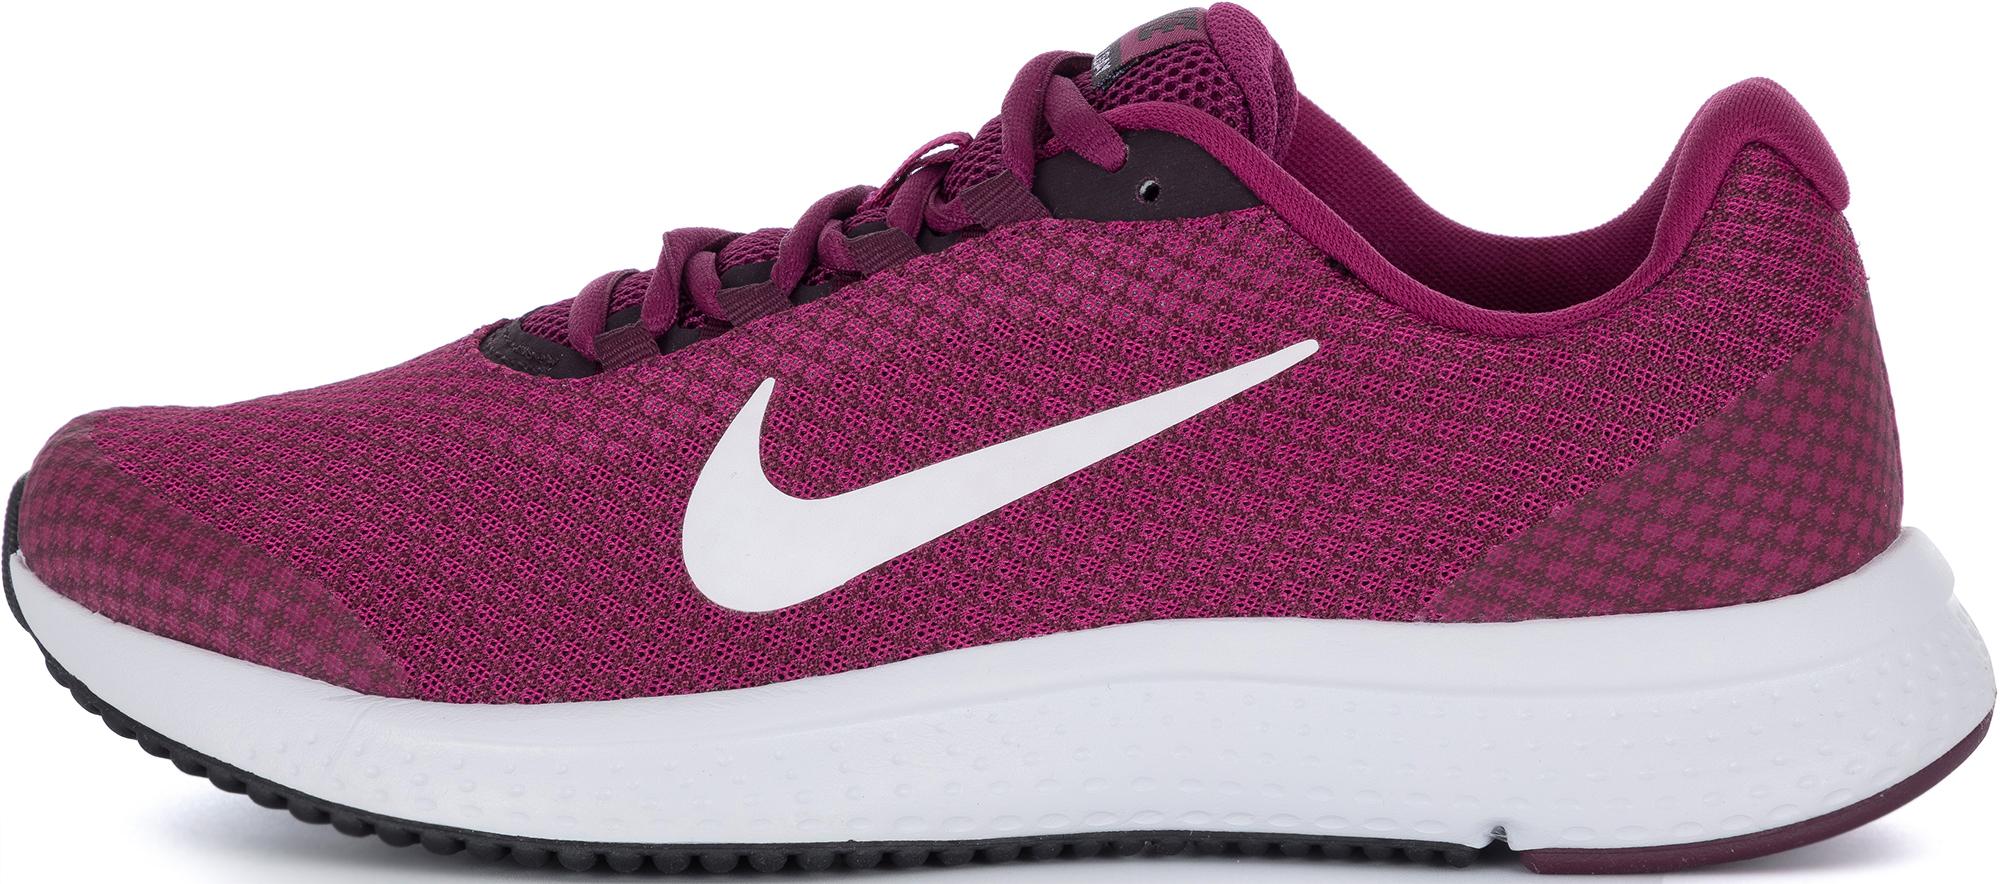 Nike Кроссовки женские Nike RunAllDay, размер 39,5